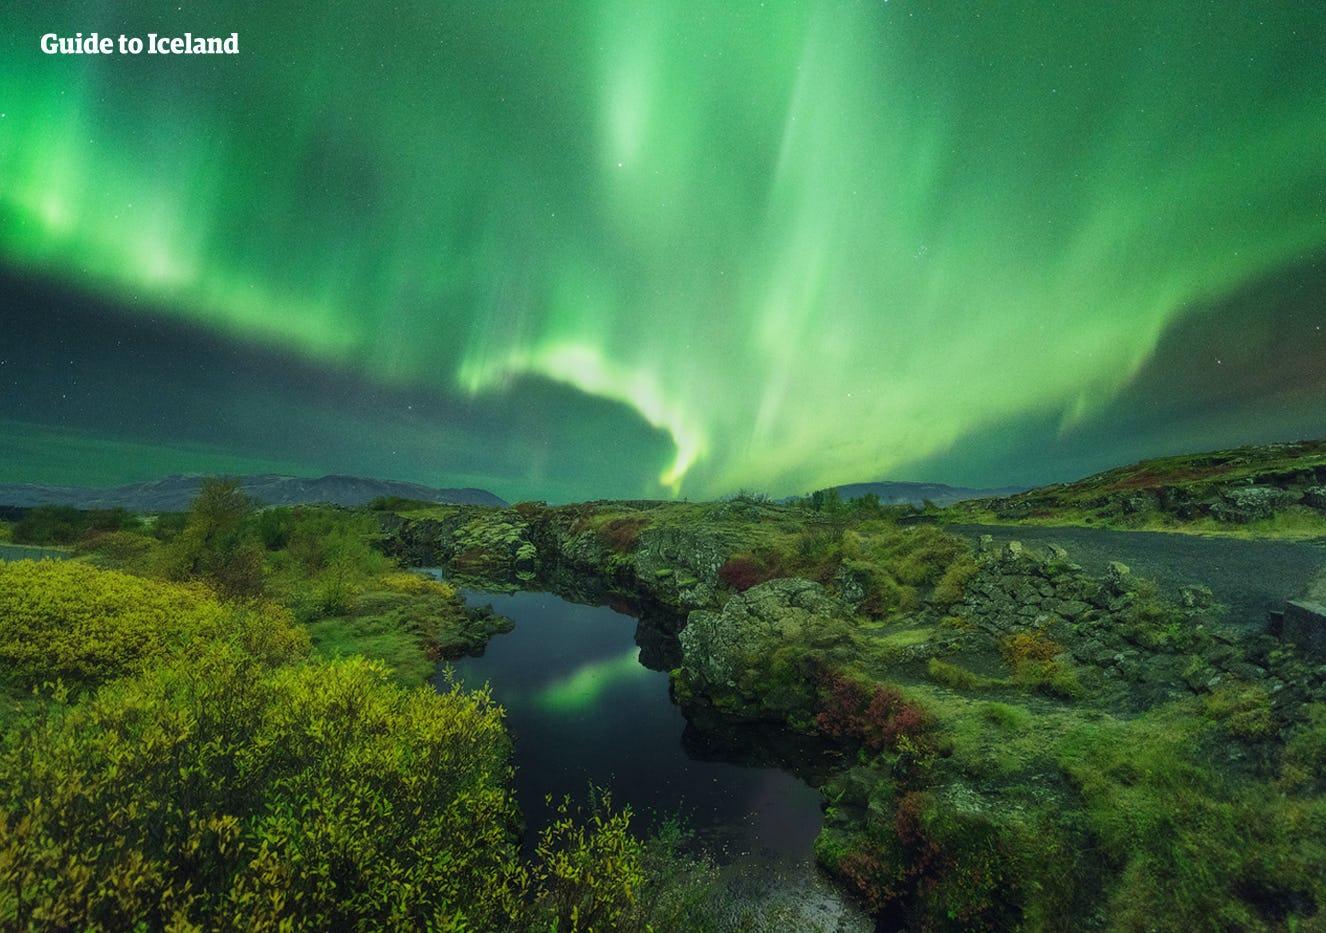 Þingvellir National Park is a wonderful place to admire the aurora borealis.